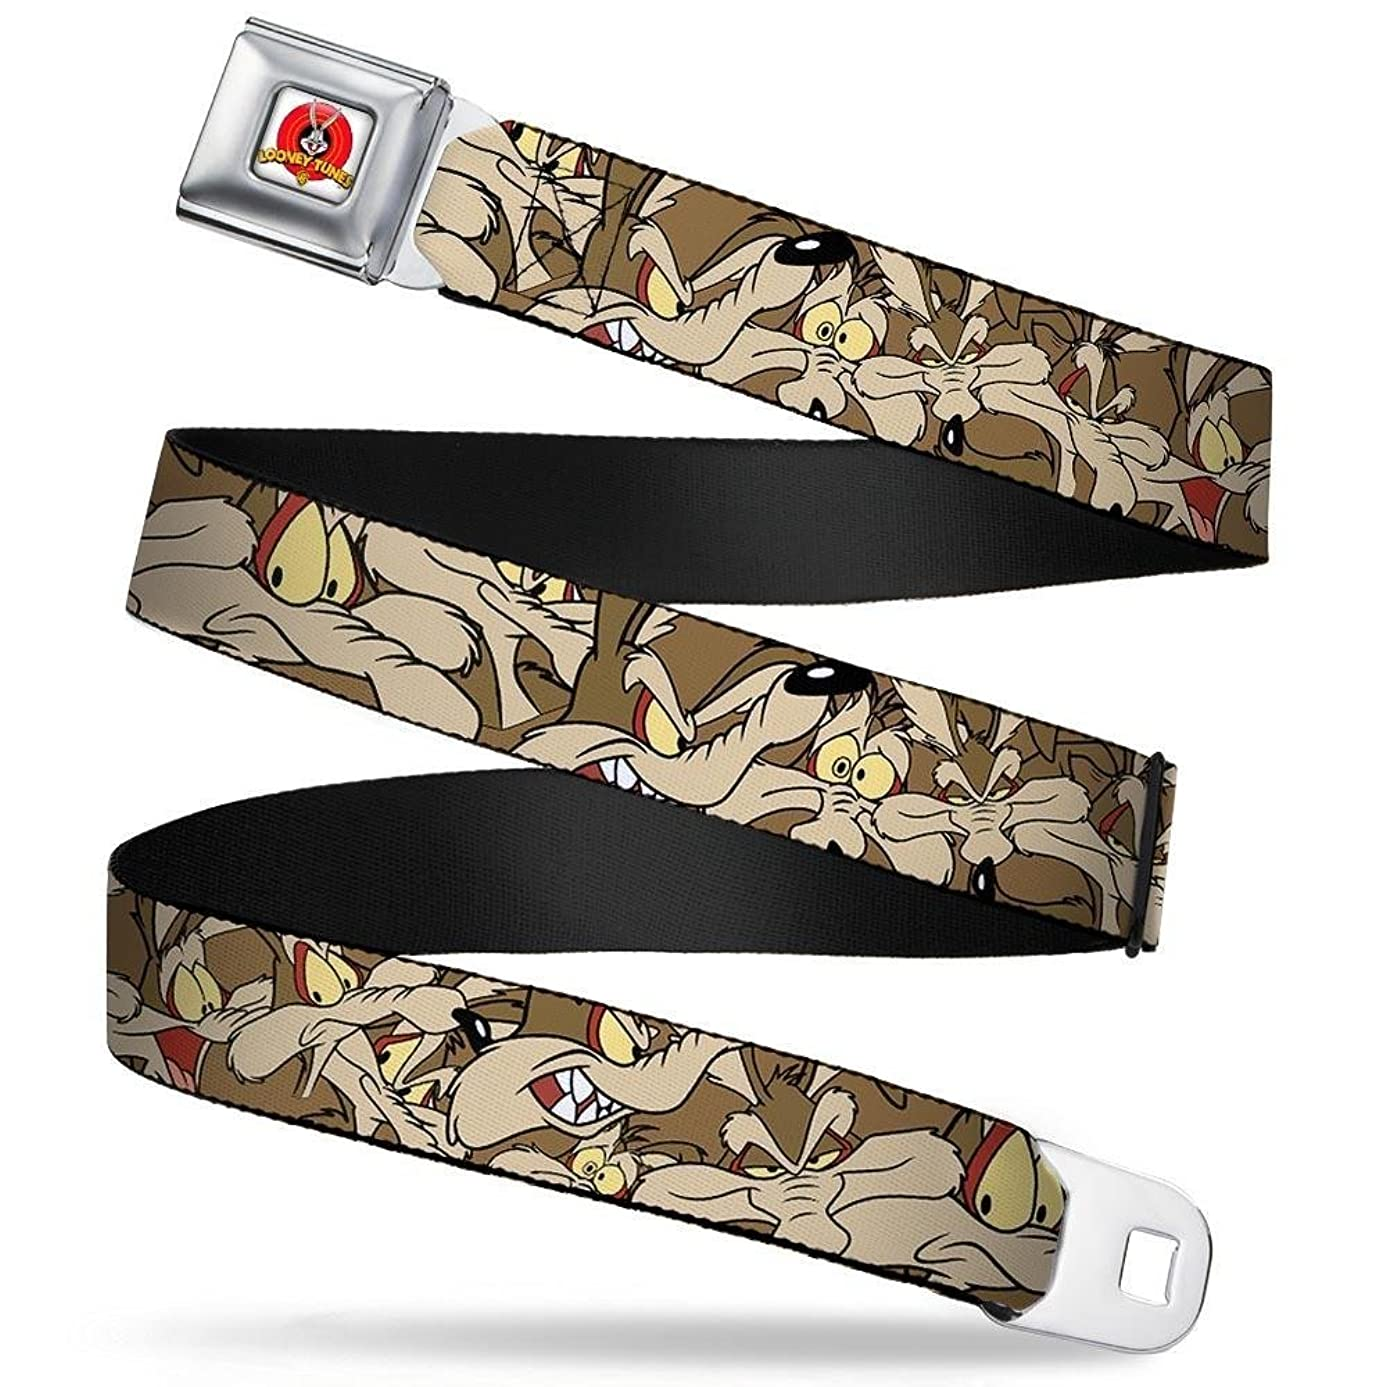 Buckle-Down Seatbelt Belt Wile E. Coyote Wltwc003